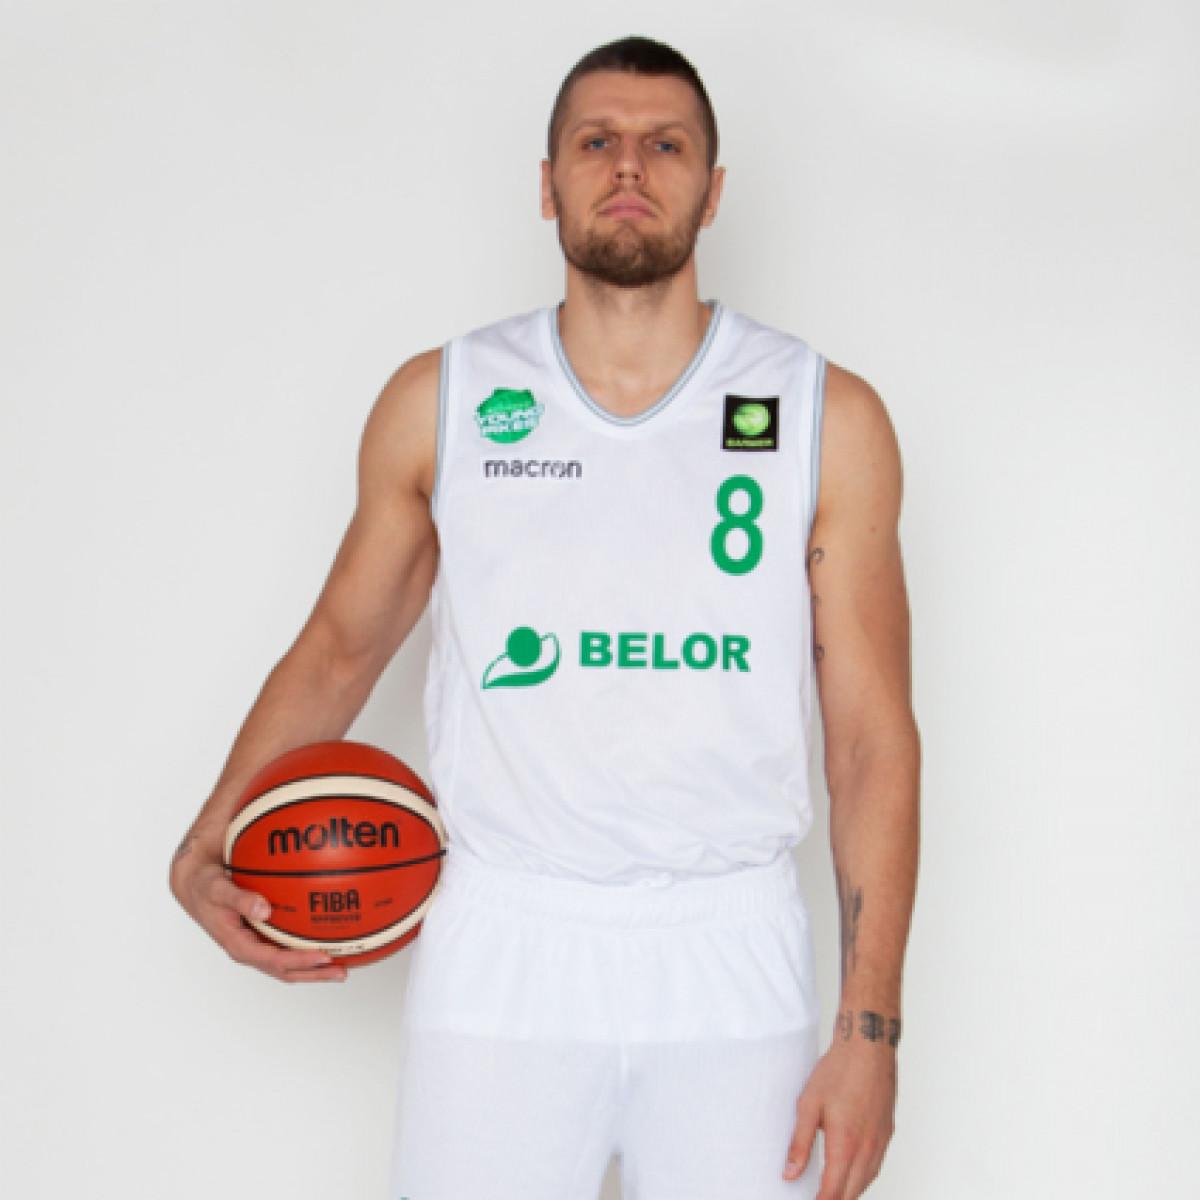 Photo of Tautvydas Slezas, 2018-2019 season